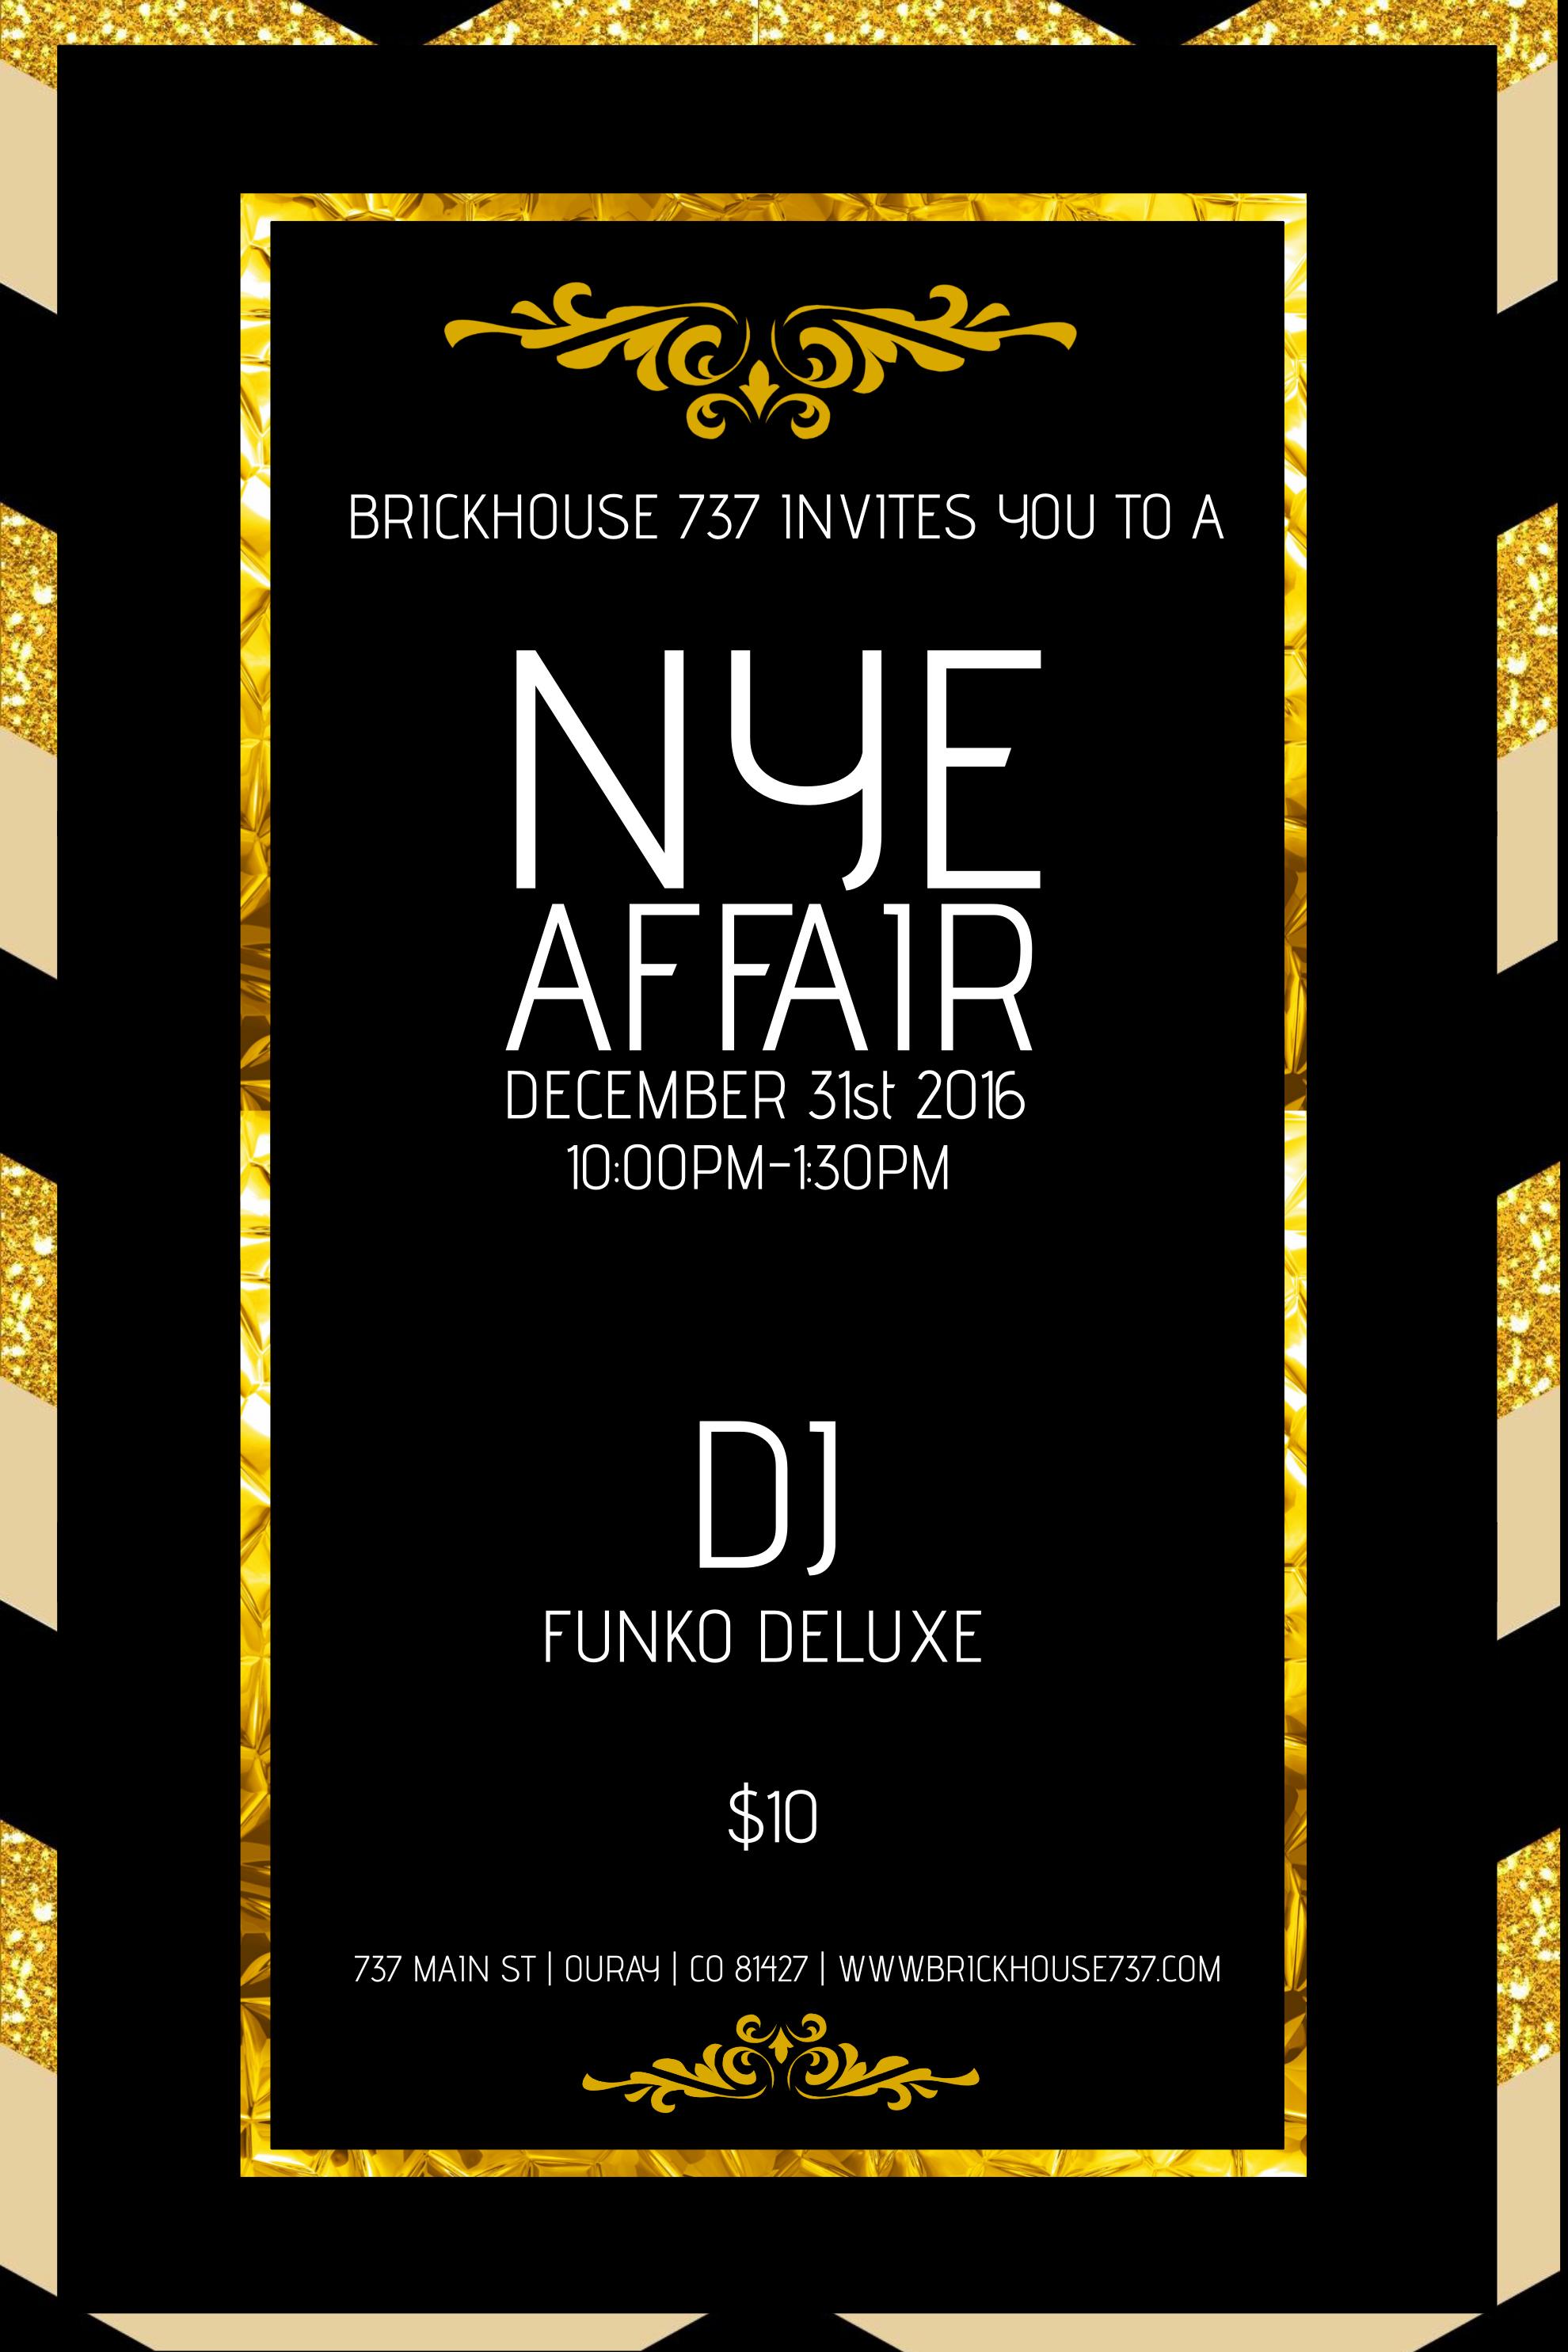 New Years Eve 2017 Brickhouse 737